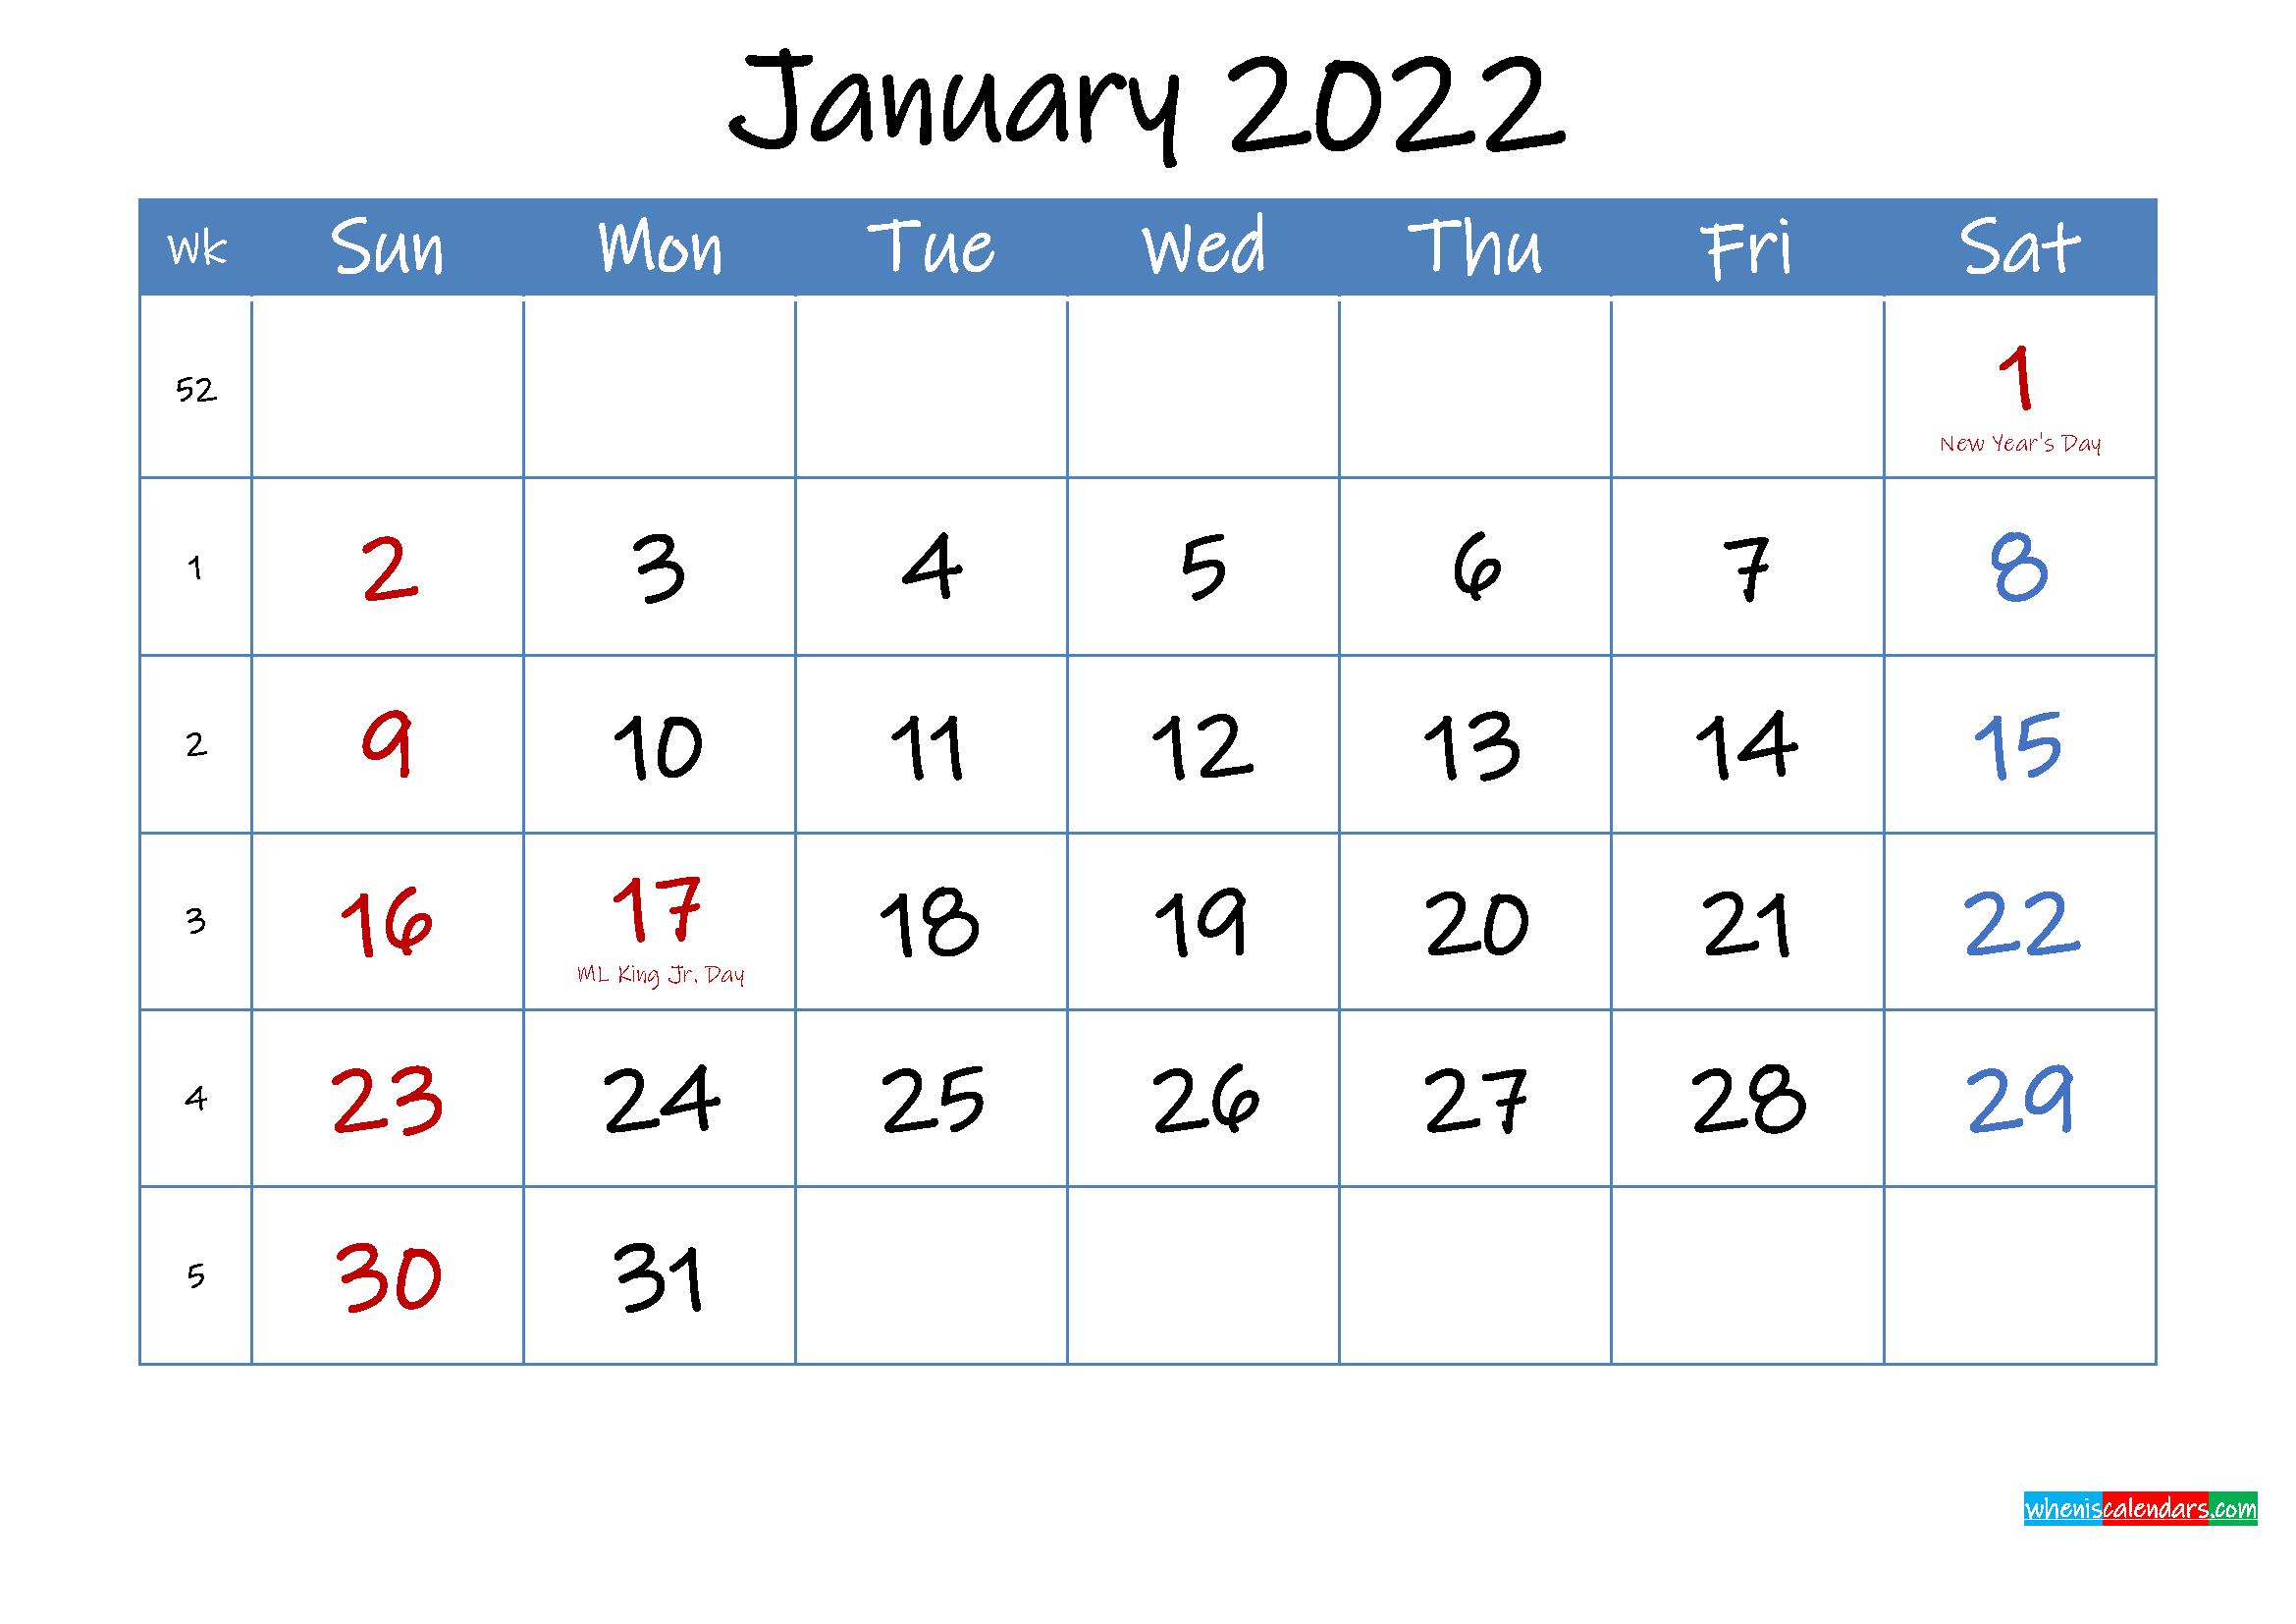 Printable January 2022 Calendar Word - Template Ink22M13 With Regard To Landscape Calendar January 2022